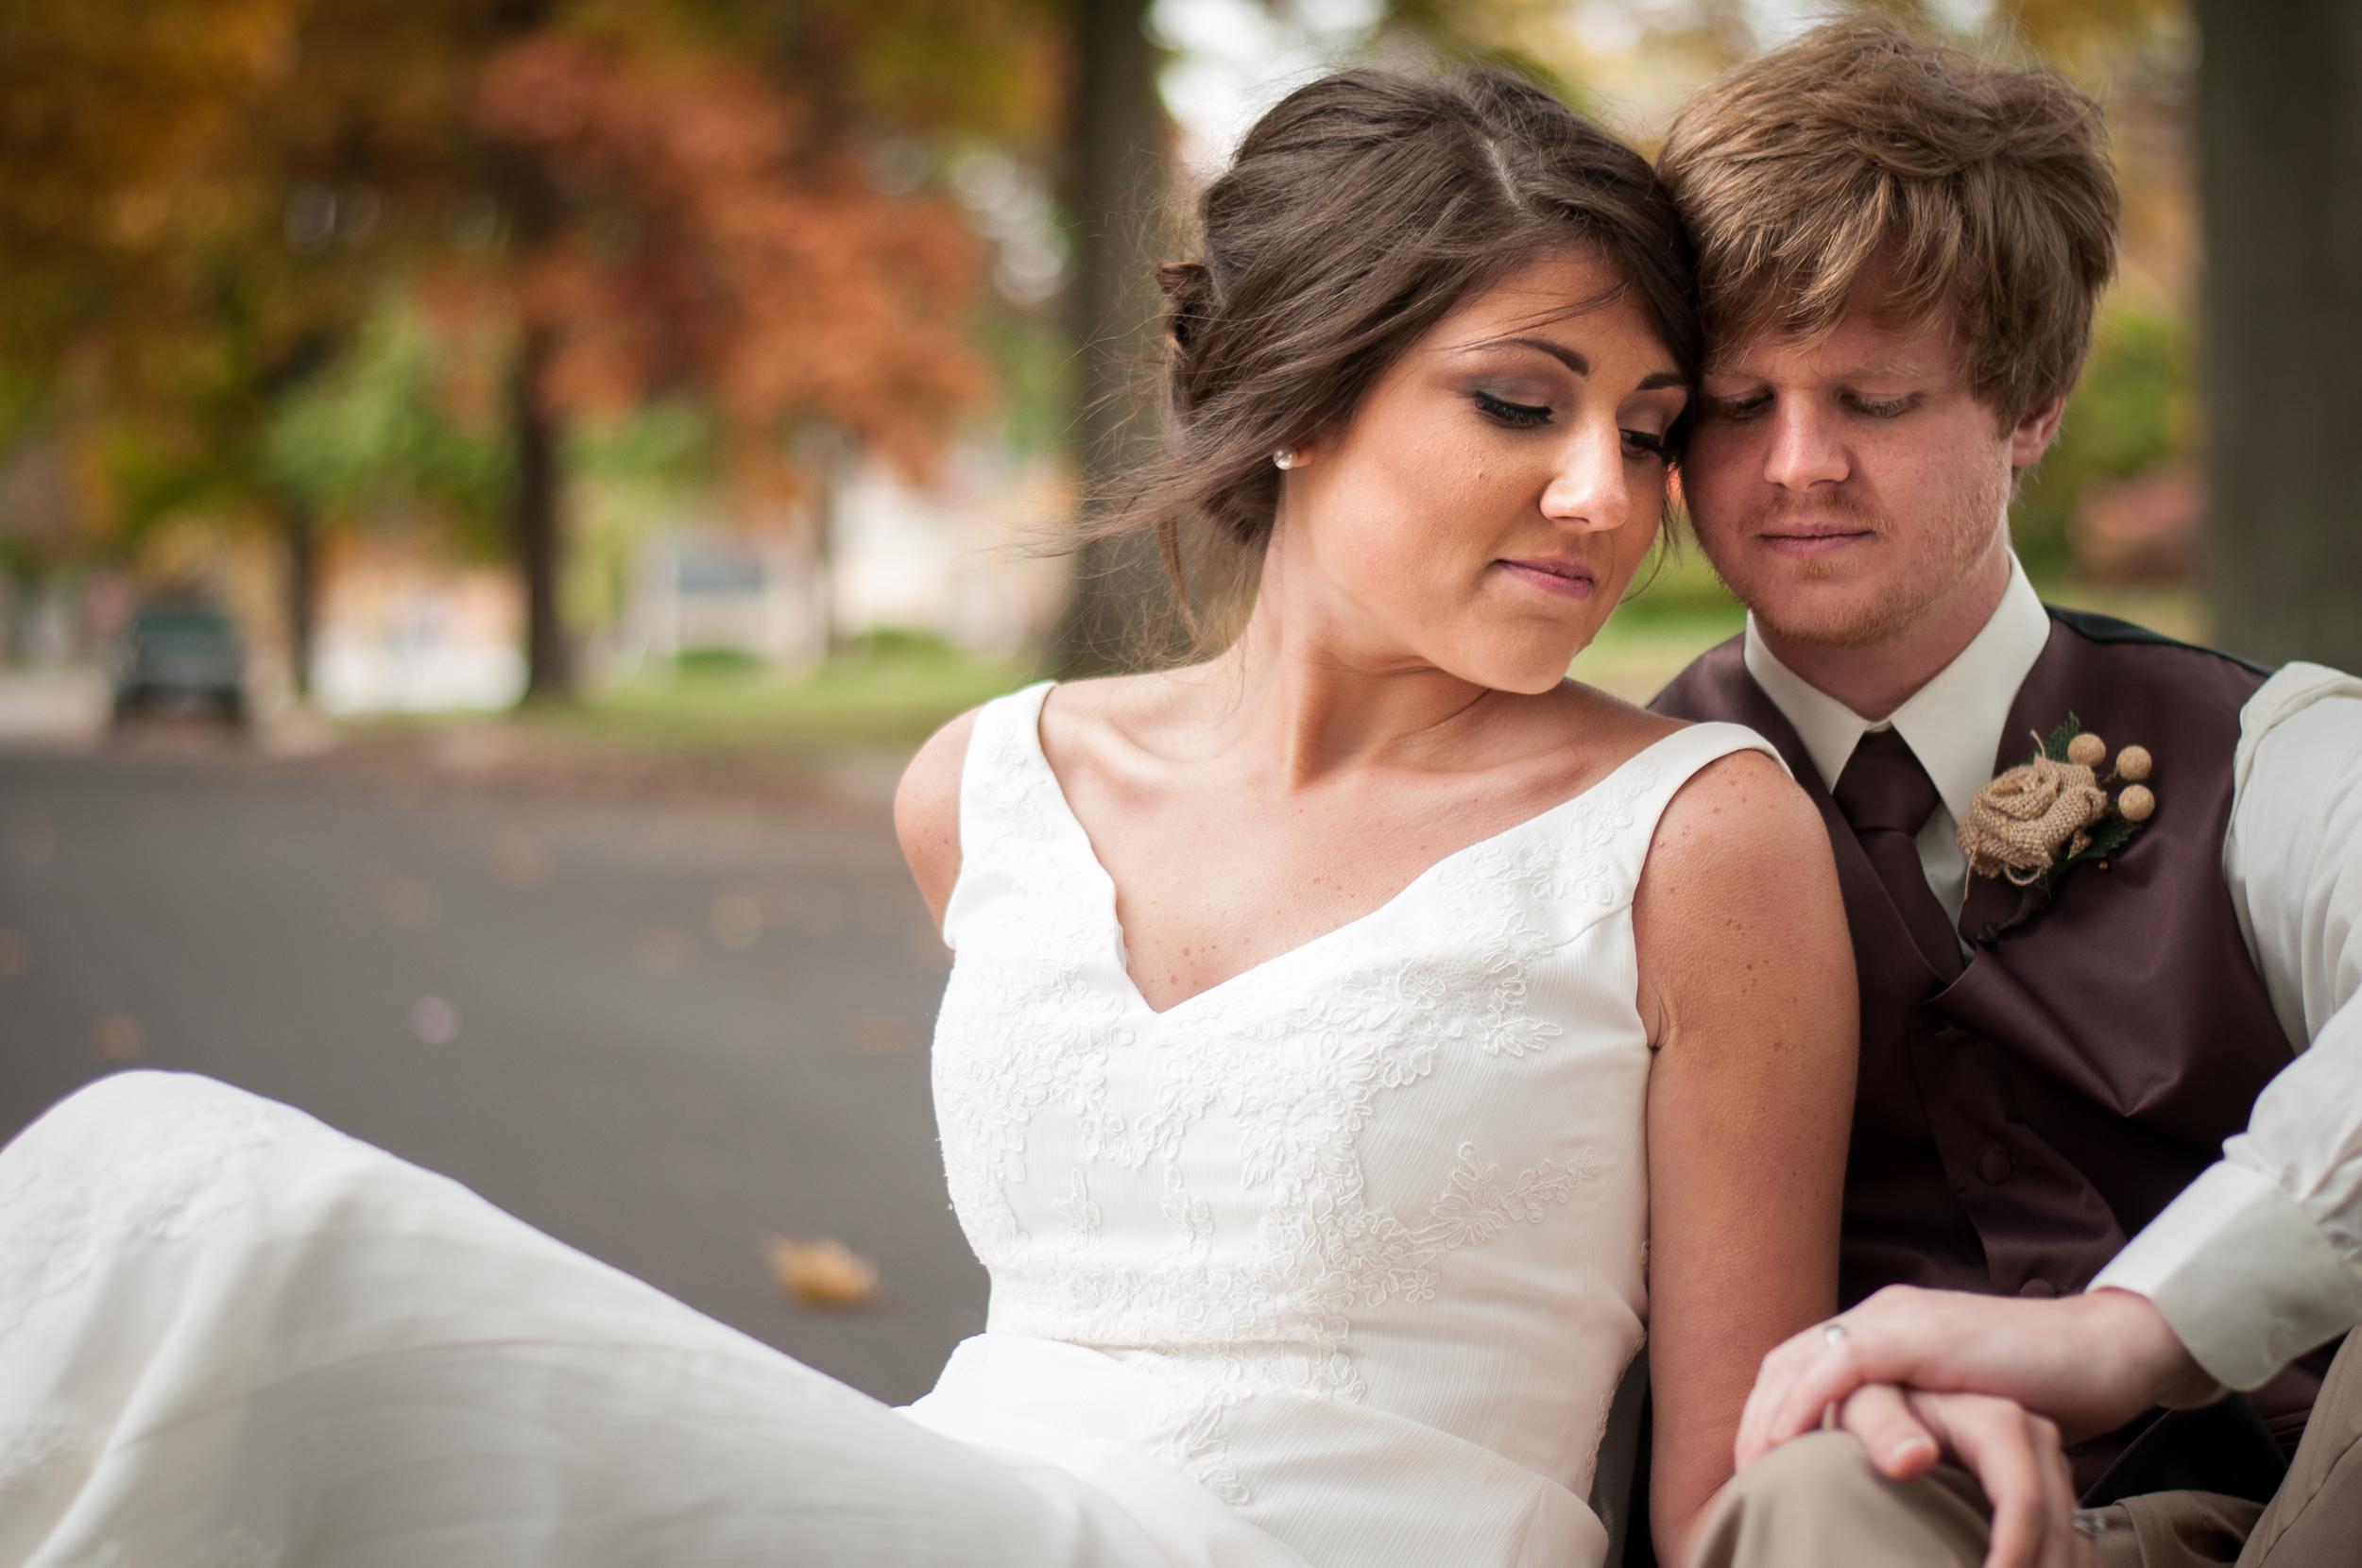 meredithdonnellyphotography-youngweddingwebsite-67.jpg